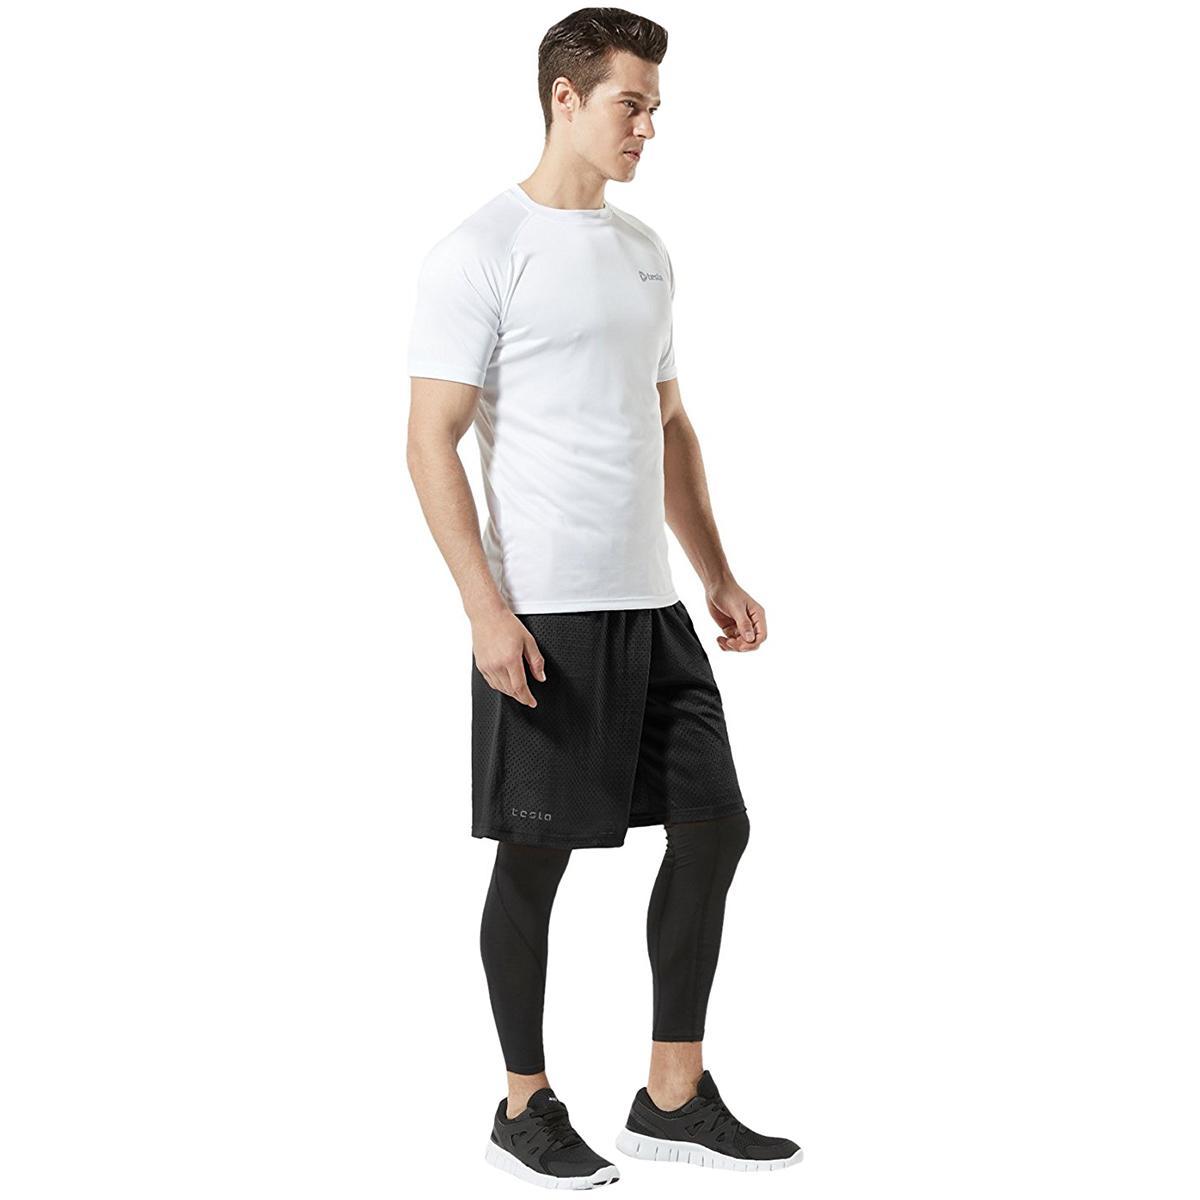 TSLA Boys Active Shorts Sports Performance Youth HyperDri w Pockets Pack of 1, 2